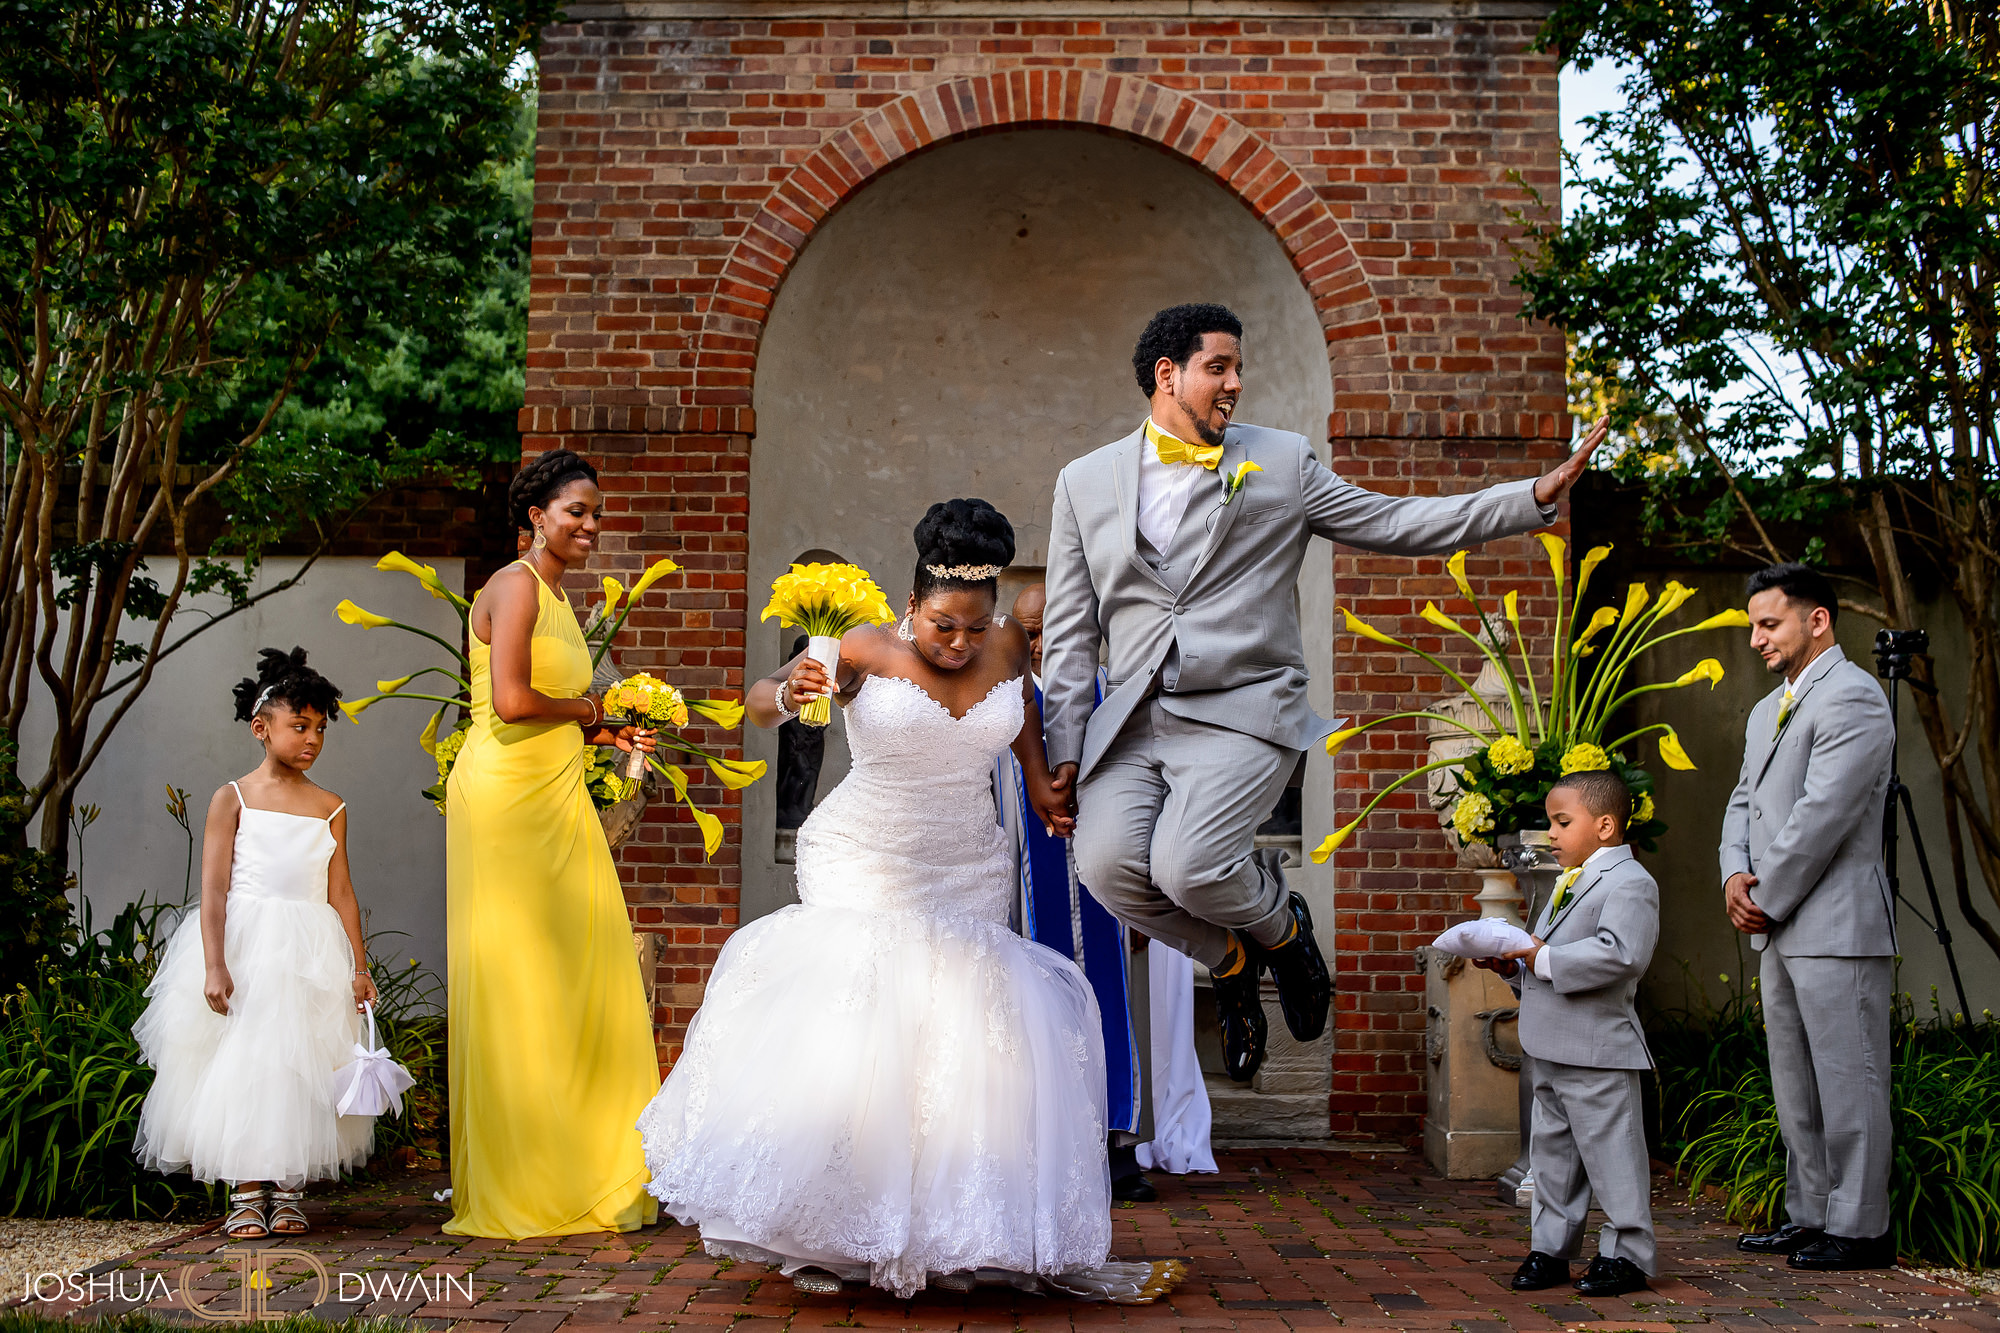 joshua-dwain-weddings-gallery-best-wedding-photographers-us-049